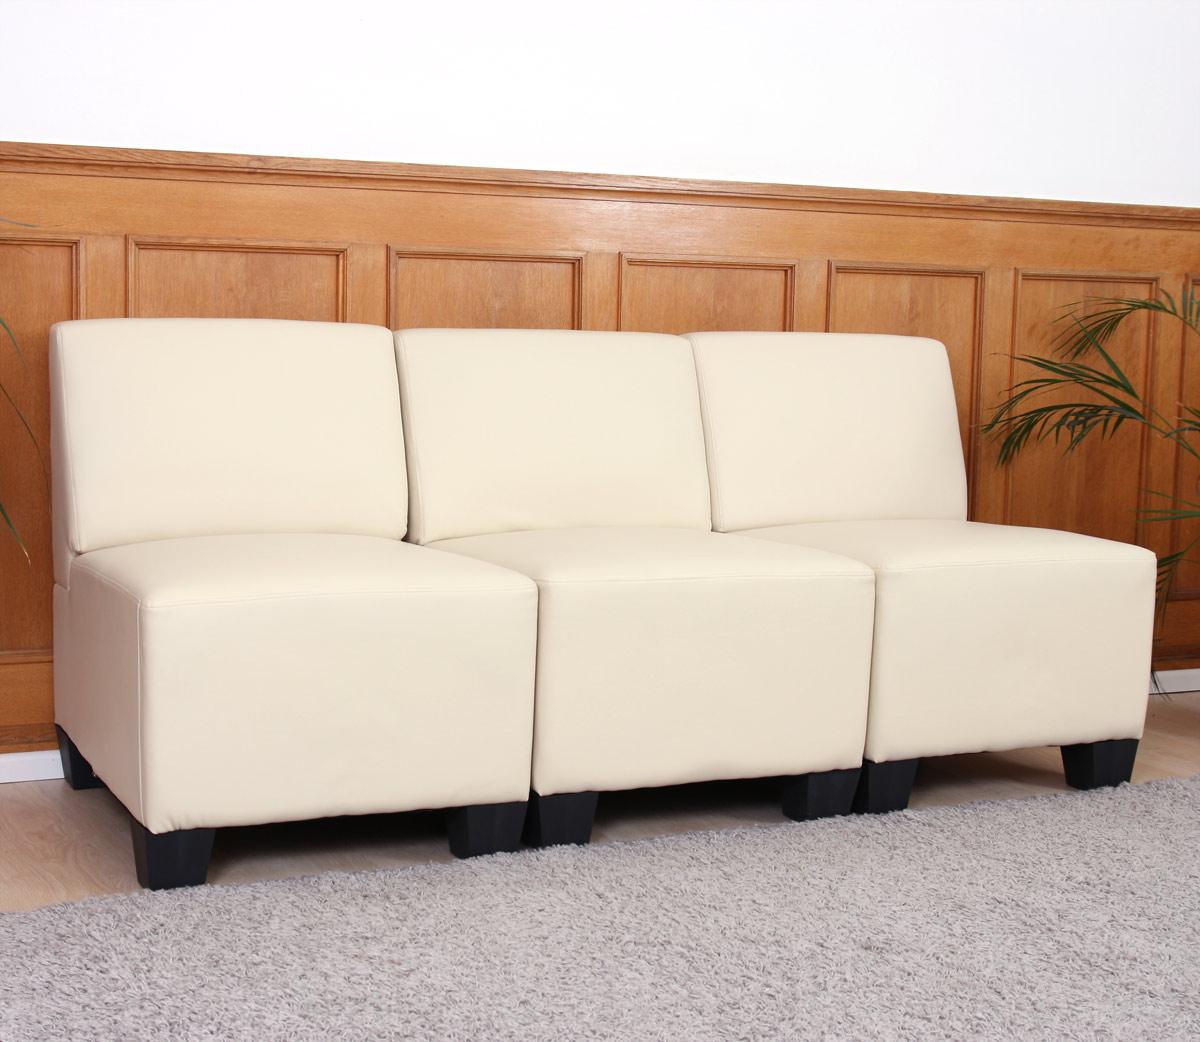 Modular 3 sitzer sofa couch lyon kunstleder ohne for Sofa 7 sitzer